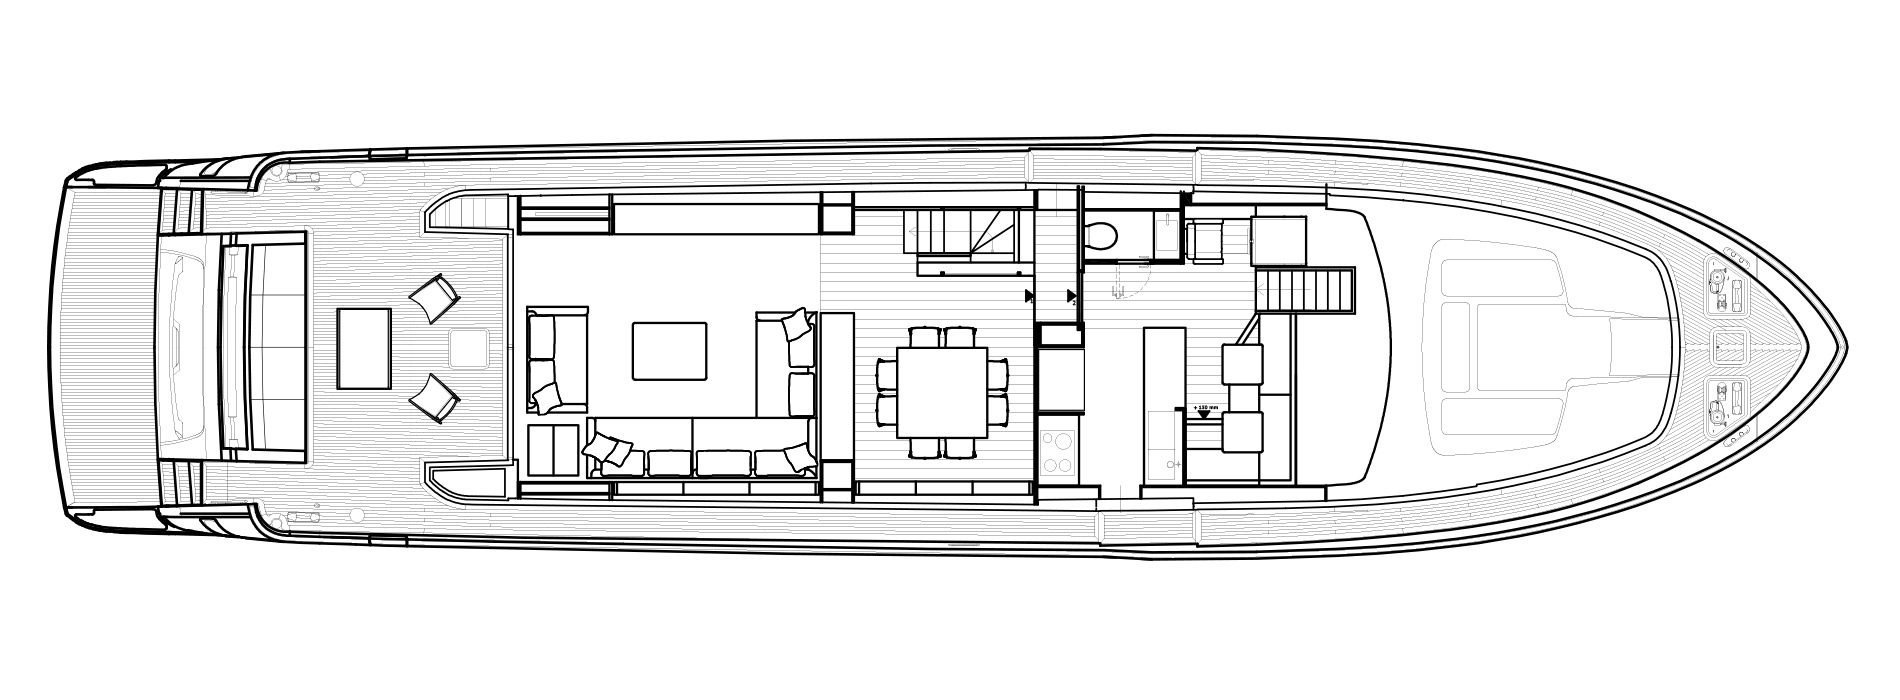 Sanlorenzo Yachts SL86 Main deck Versione USA